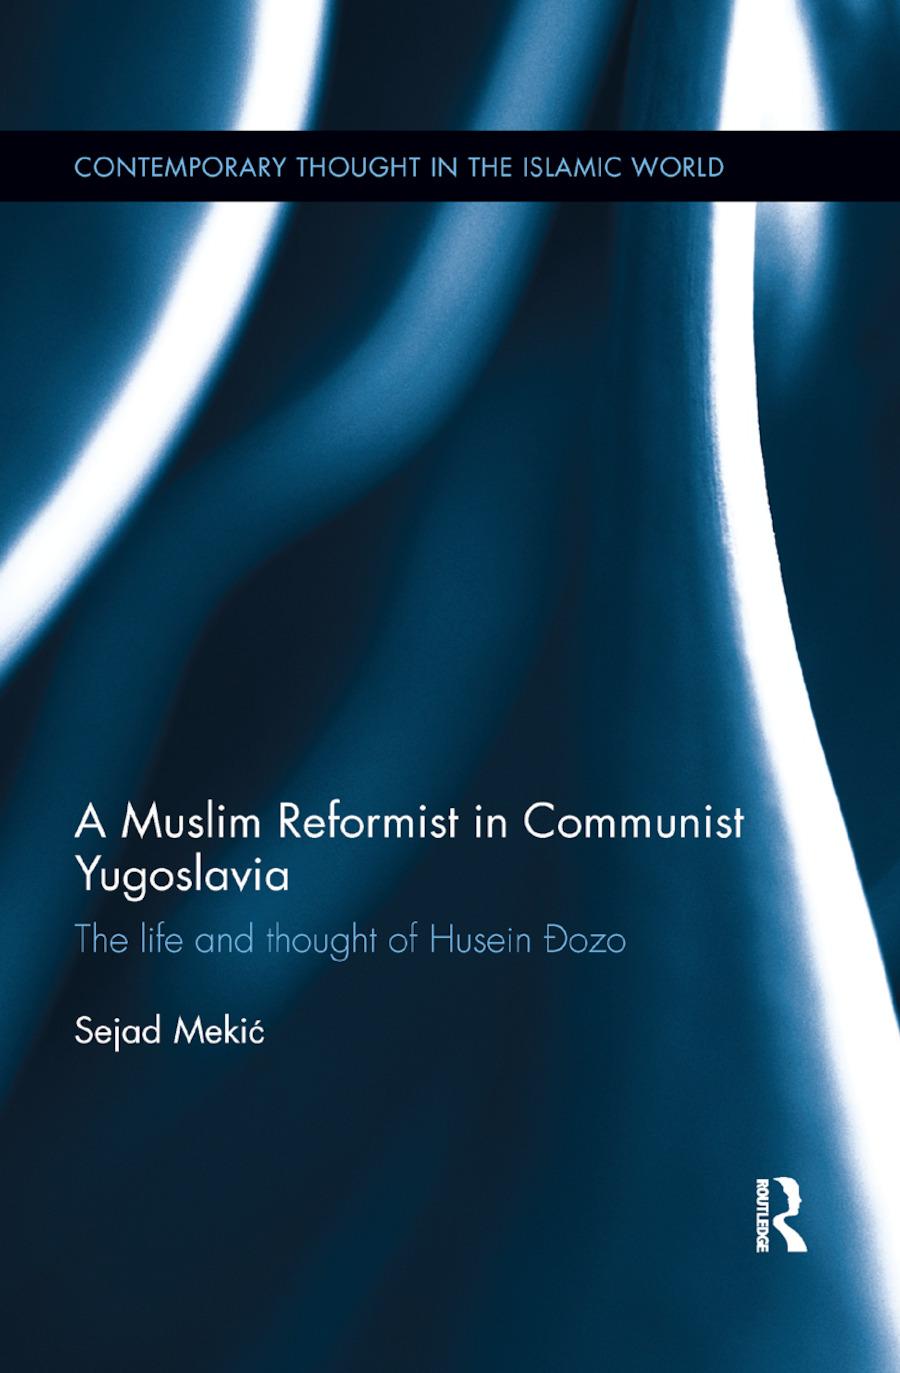 A Muslim Reformist in Communist Yugoslavia